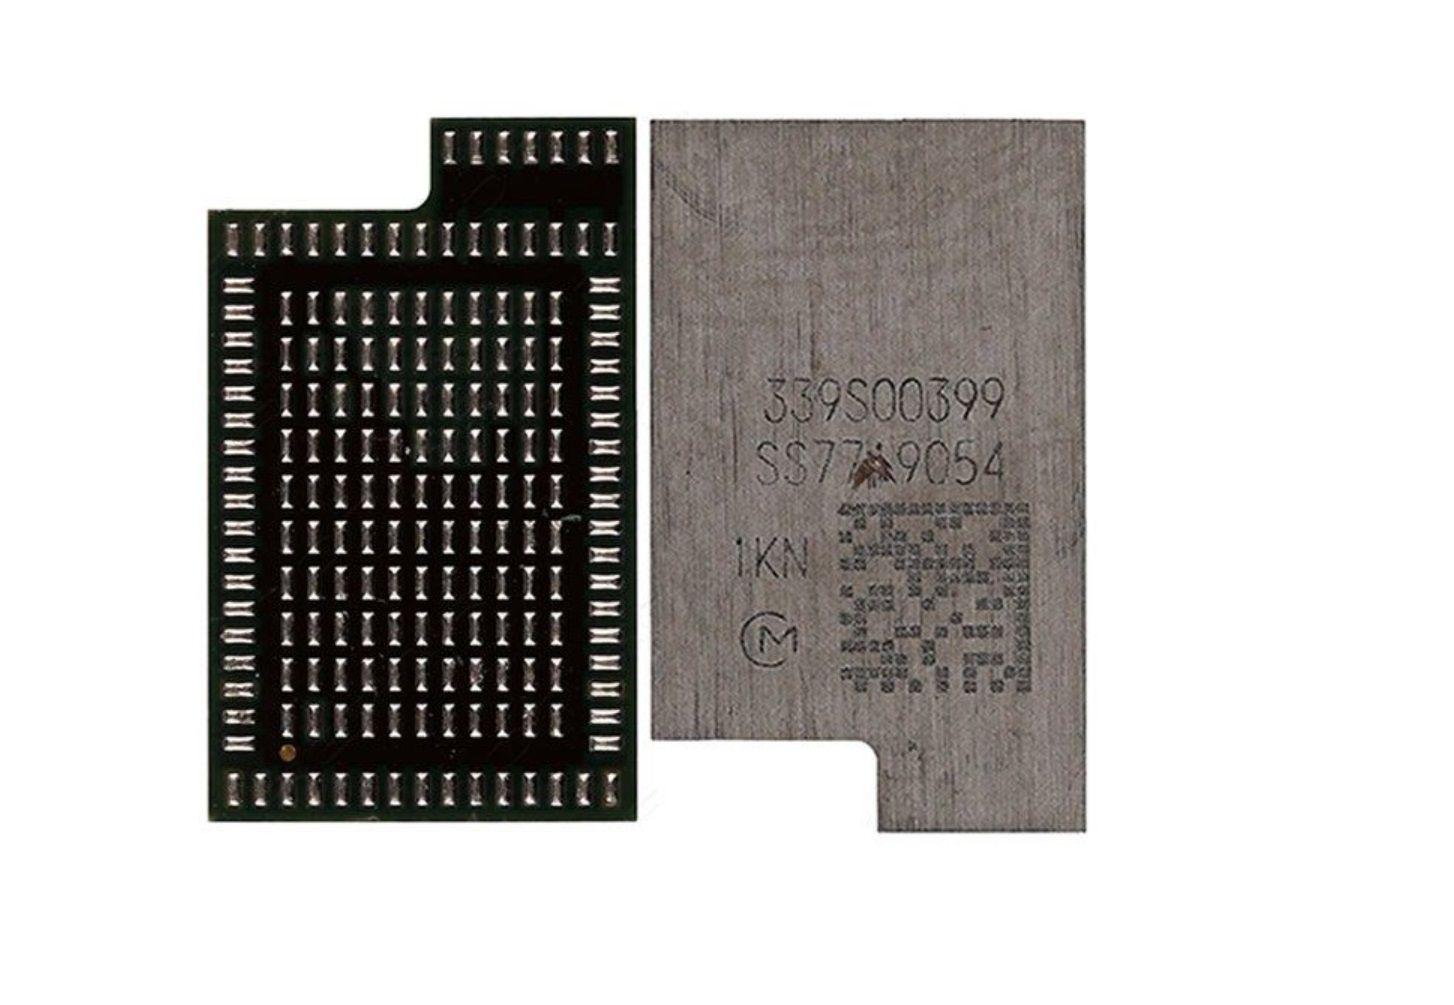 CI  339S00399 chip de wifi para iPhone 8, 8 Plus, X